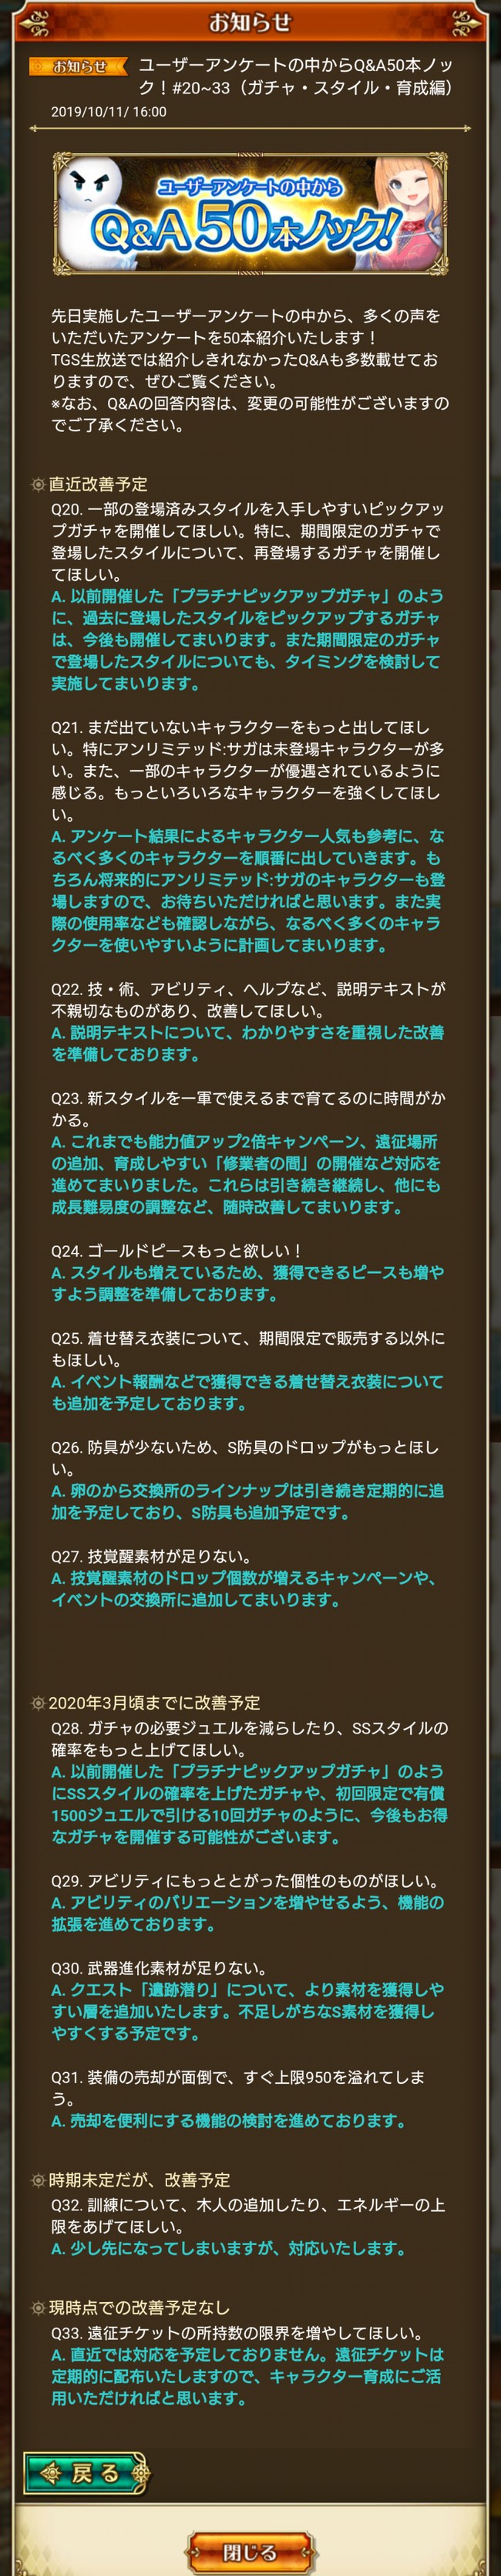 2019-10-11_17-22-49